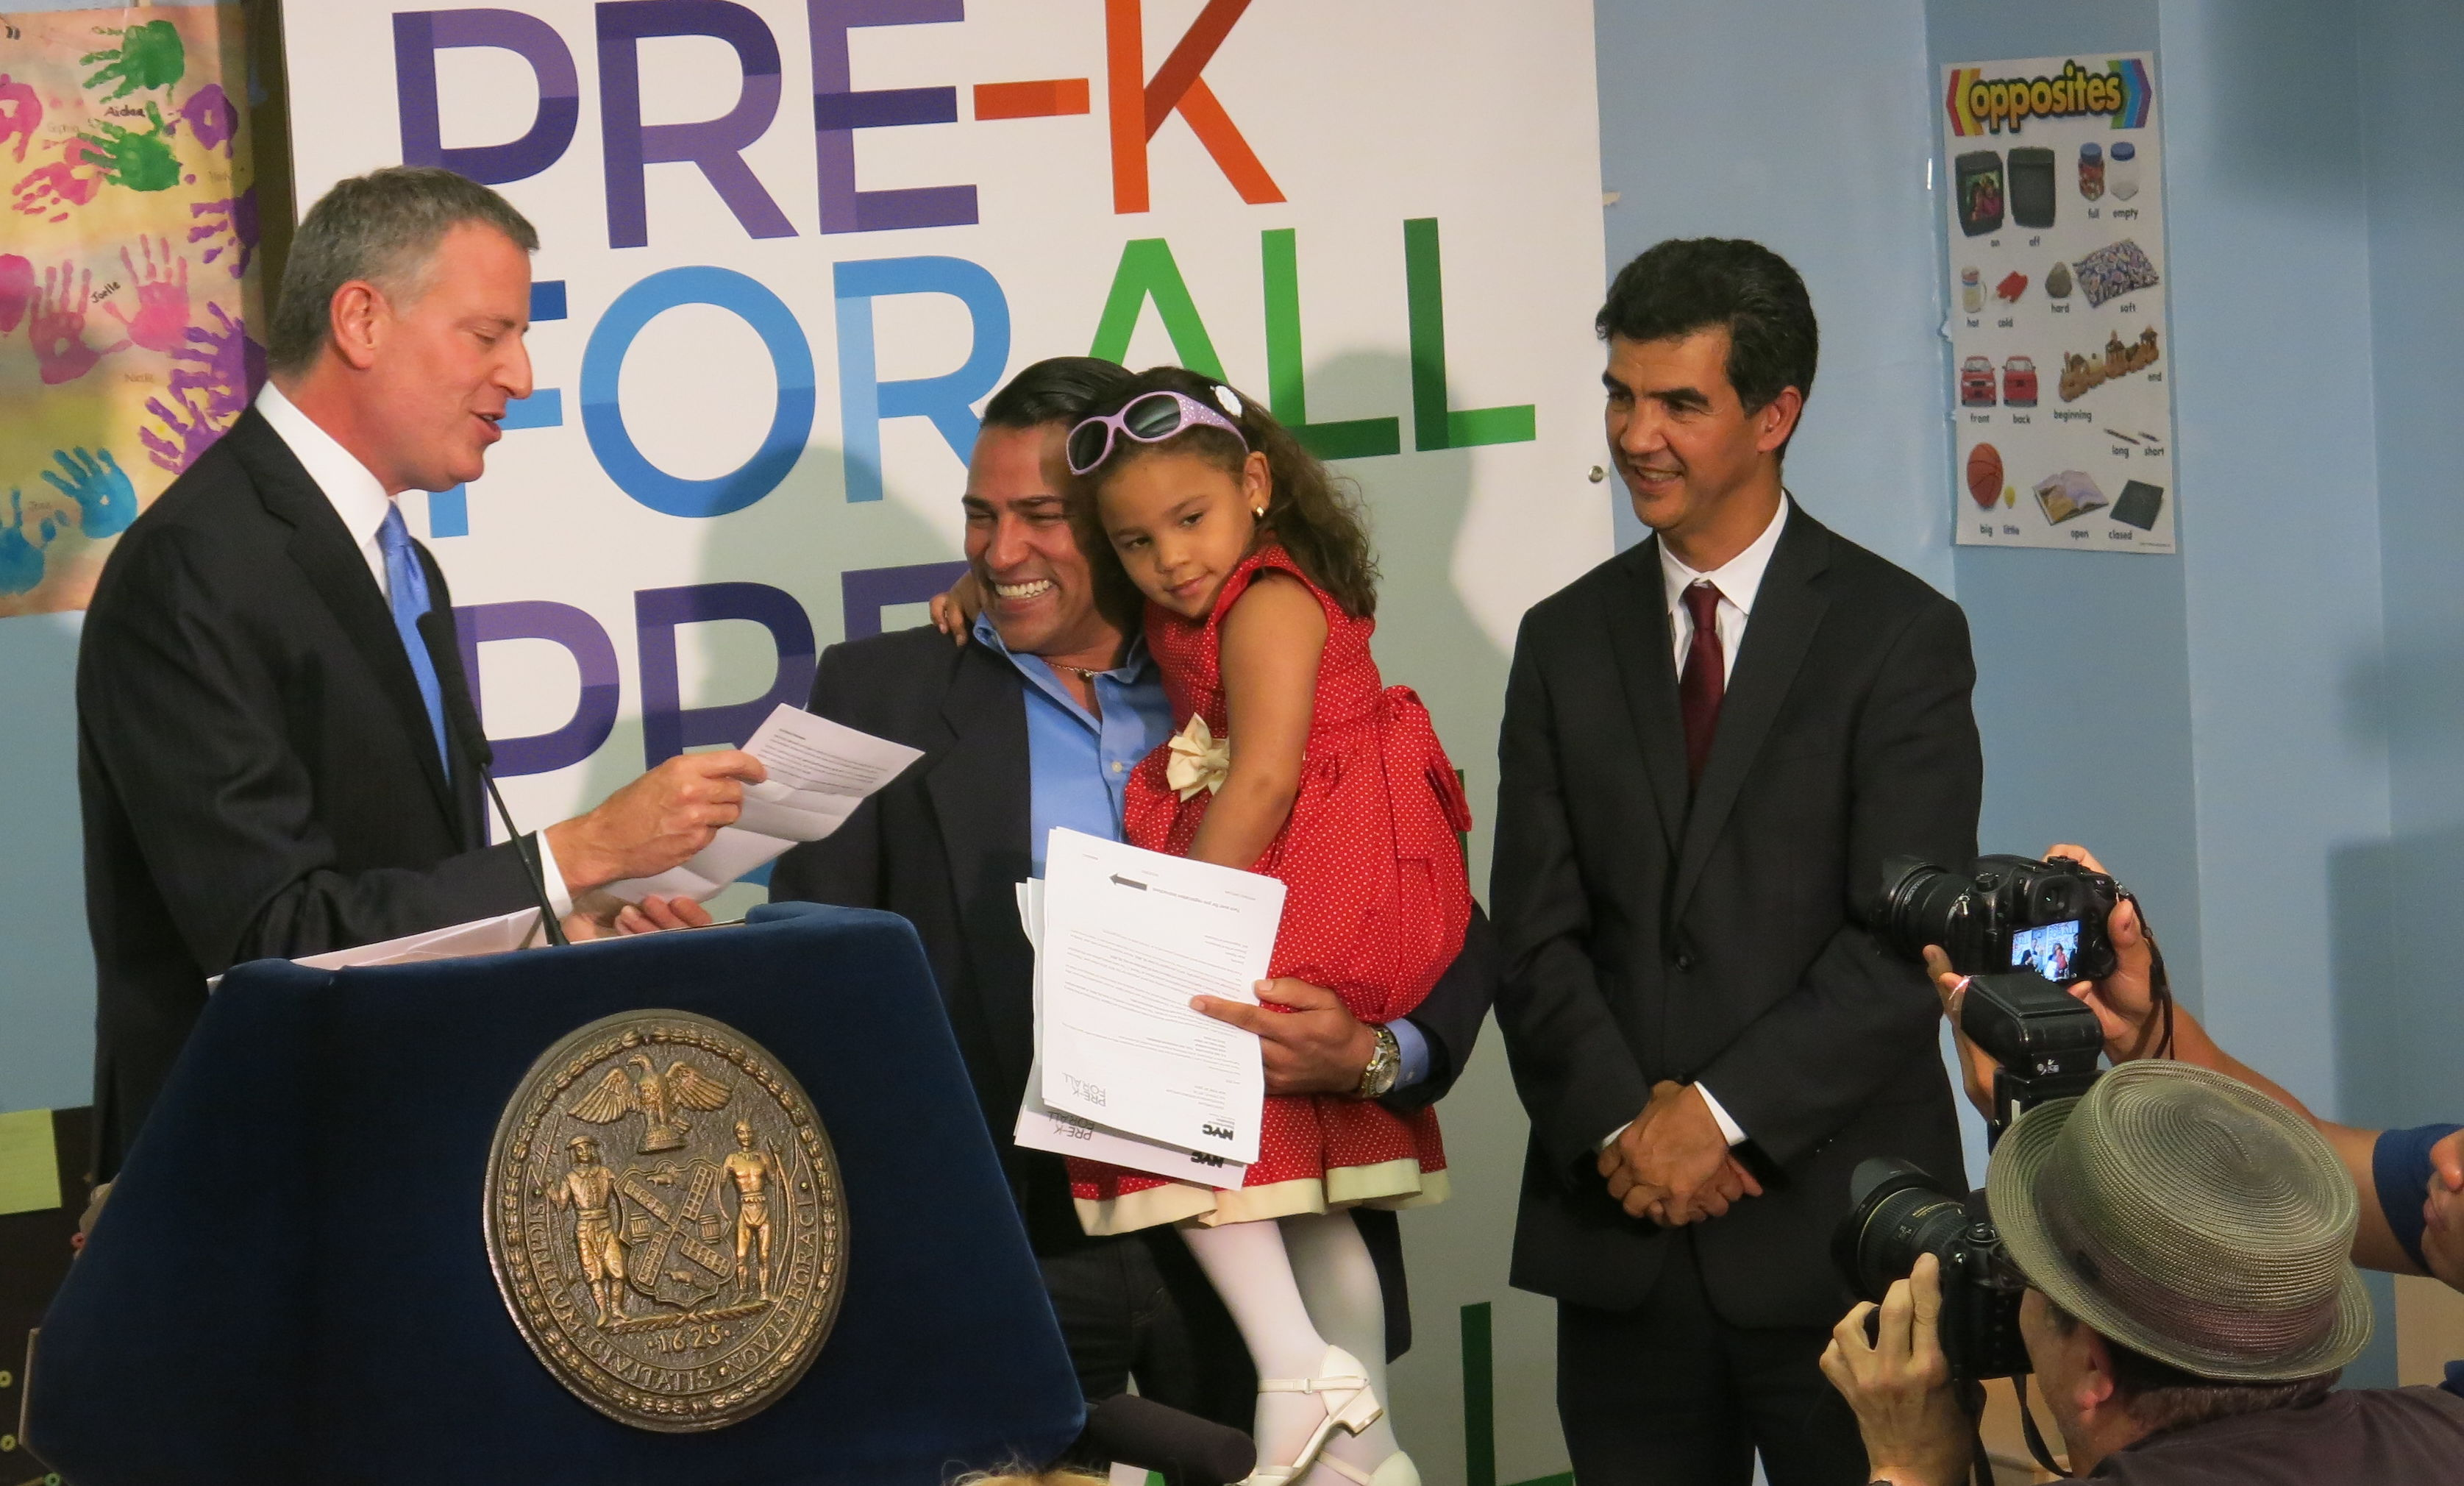 Mayor Bill de Blasio presented Olivio Capellan and his four children with pre-K offer letters.